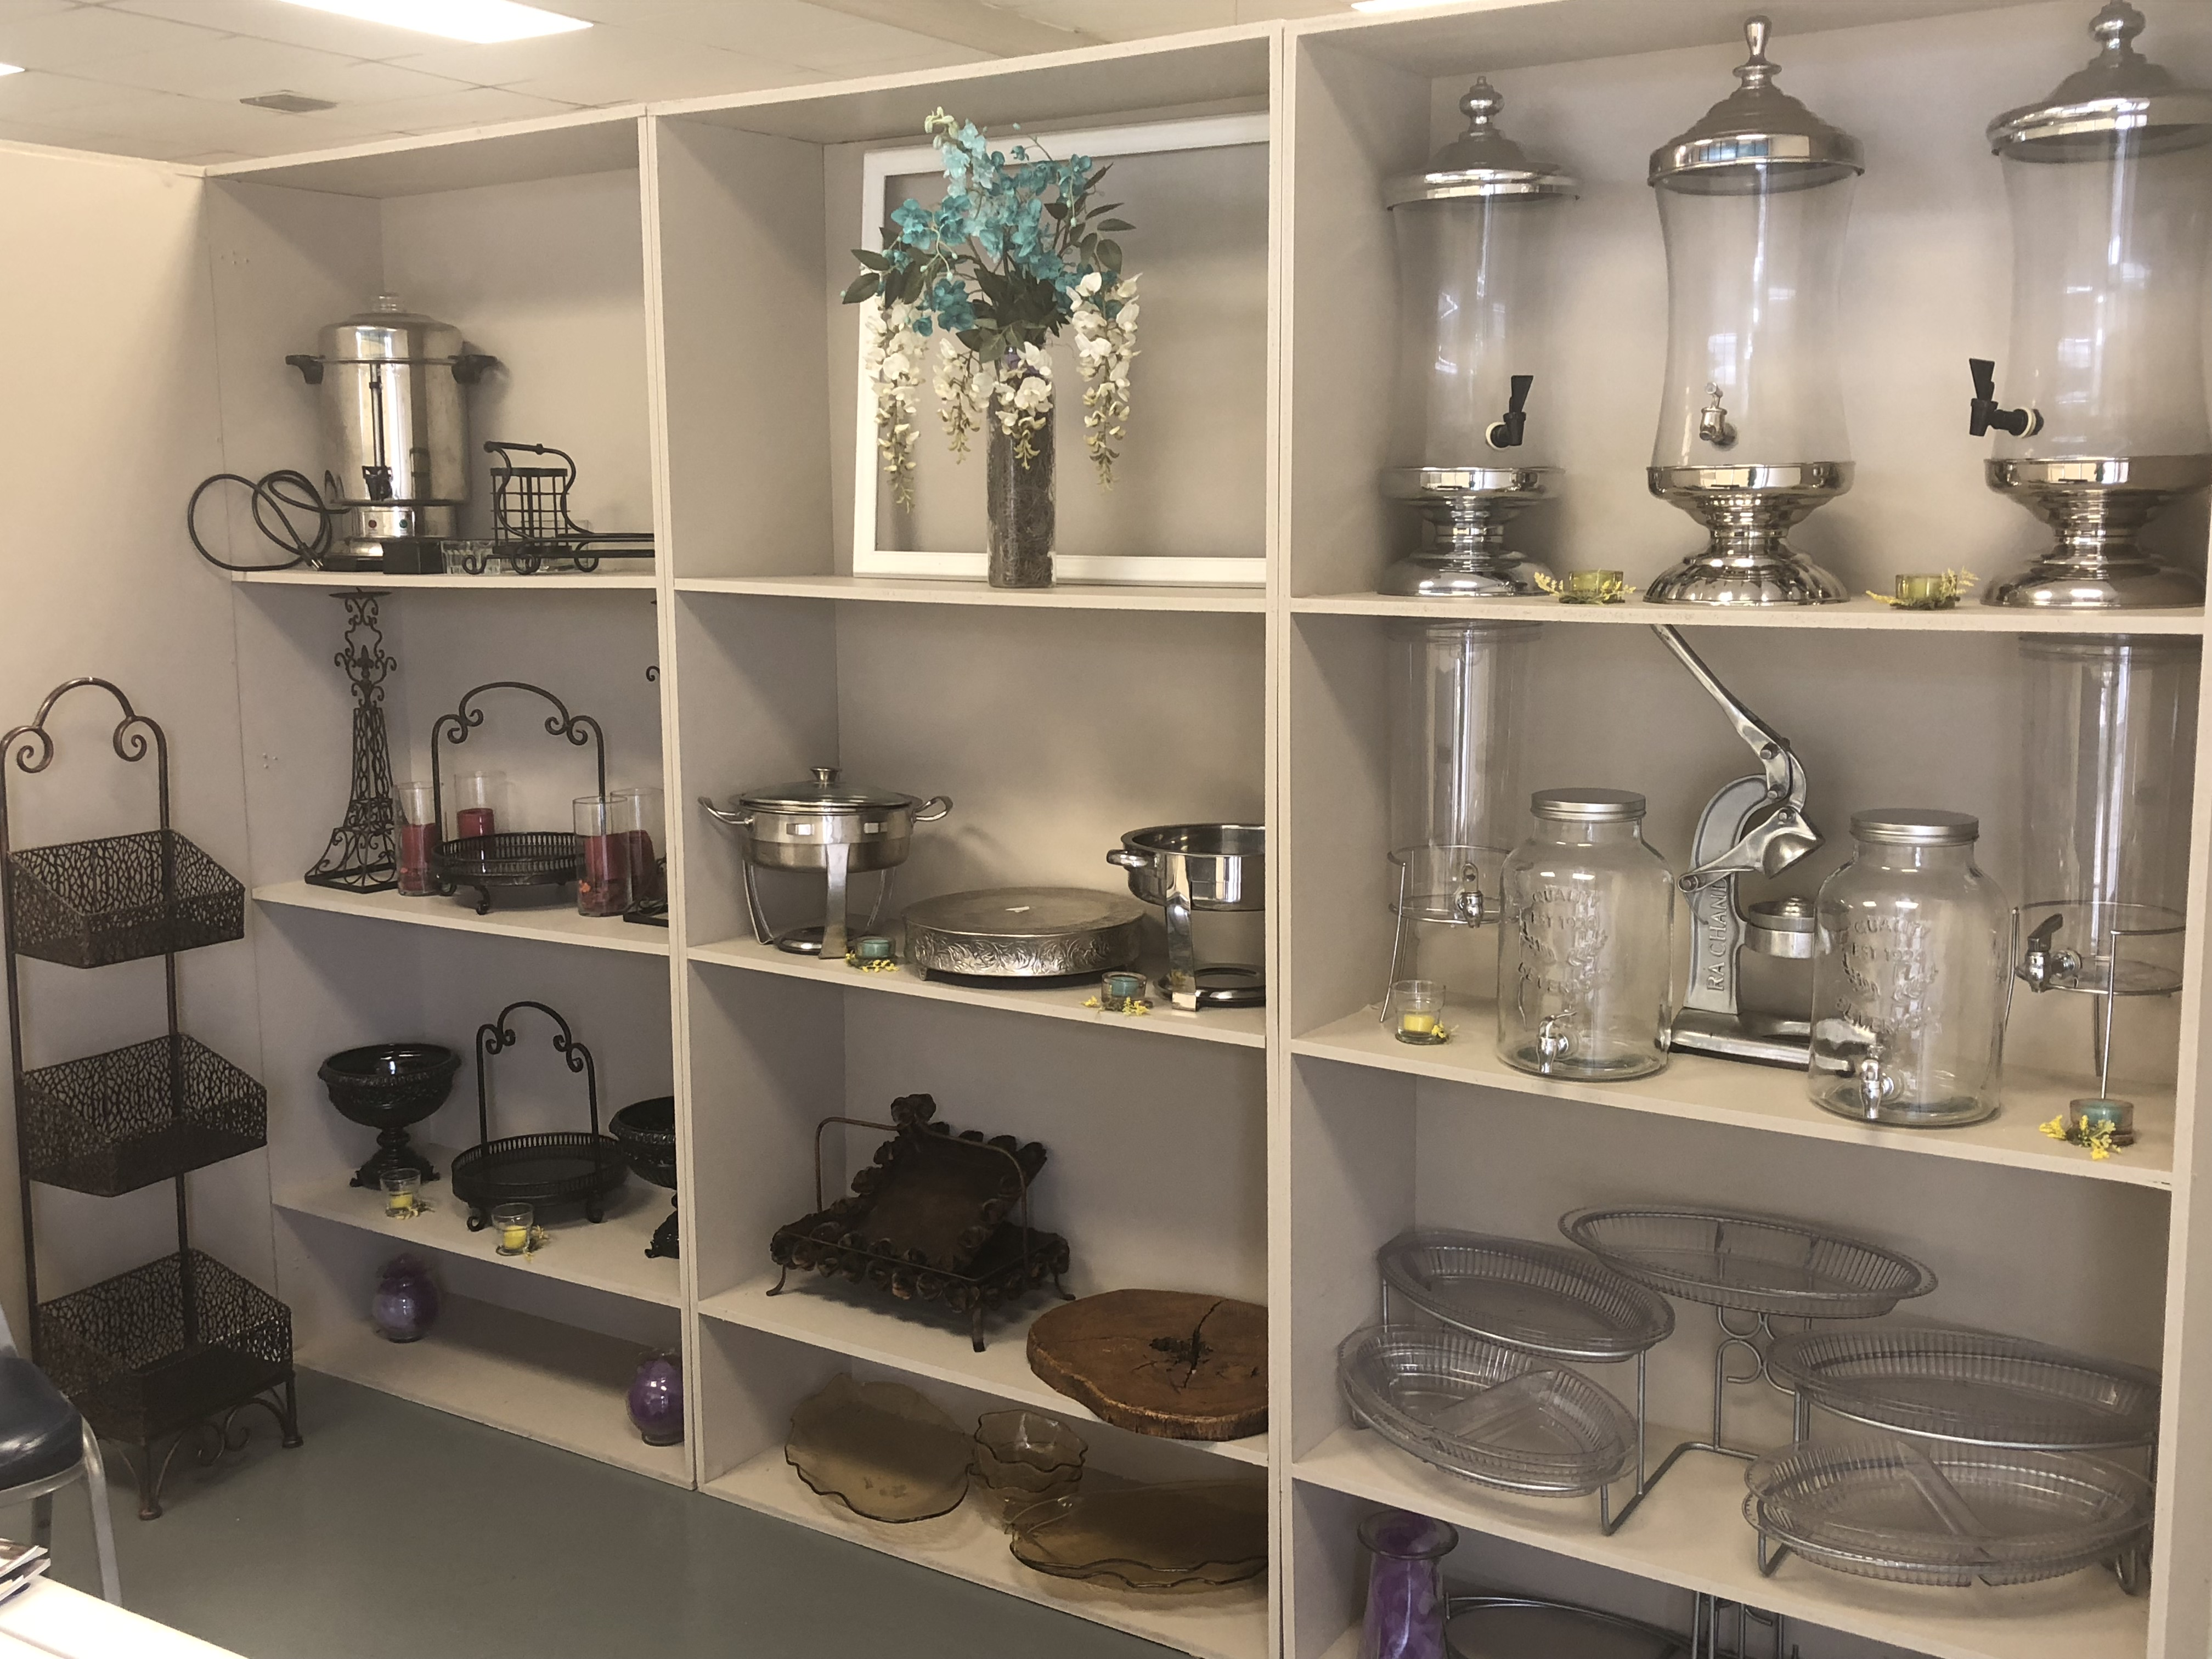 Rental Catering Equipment